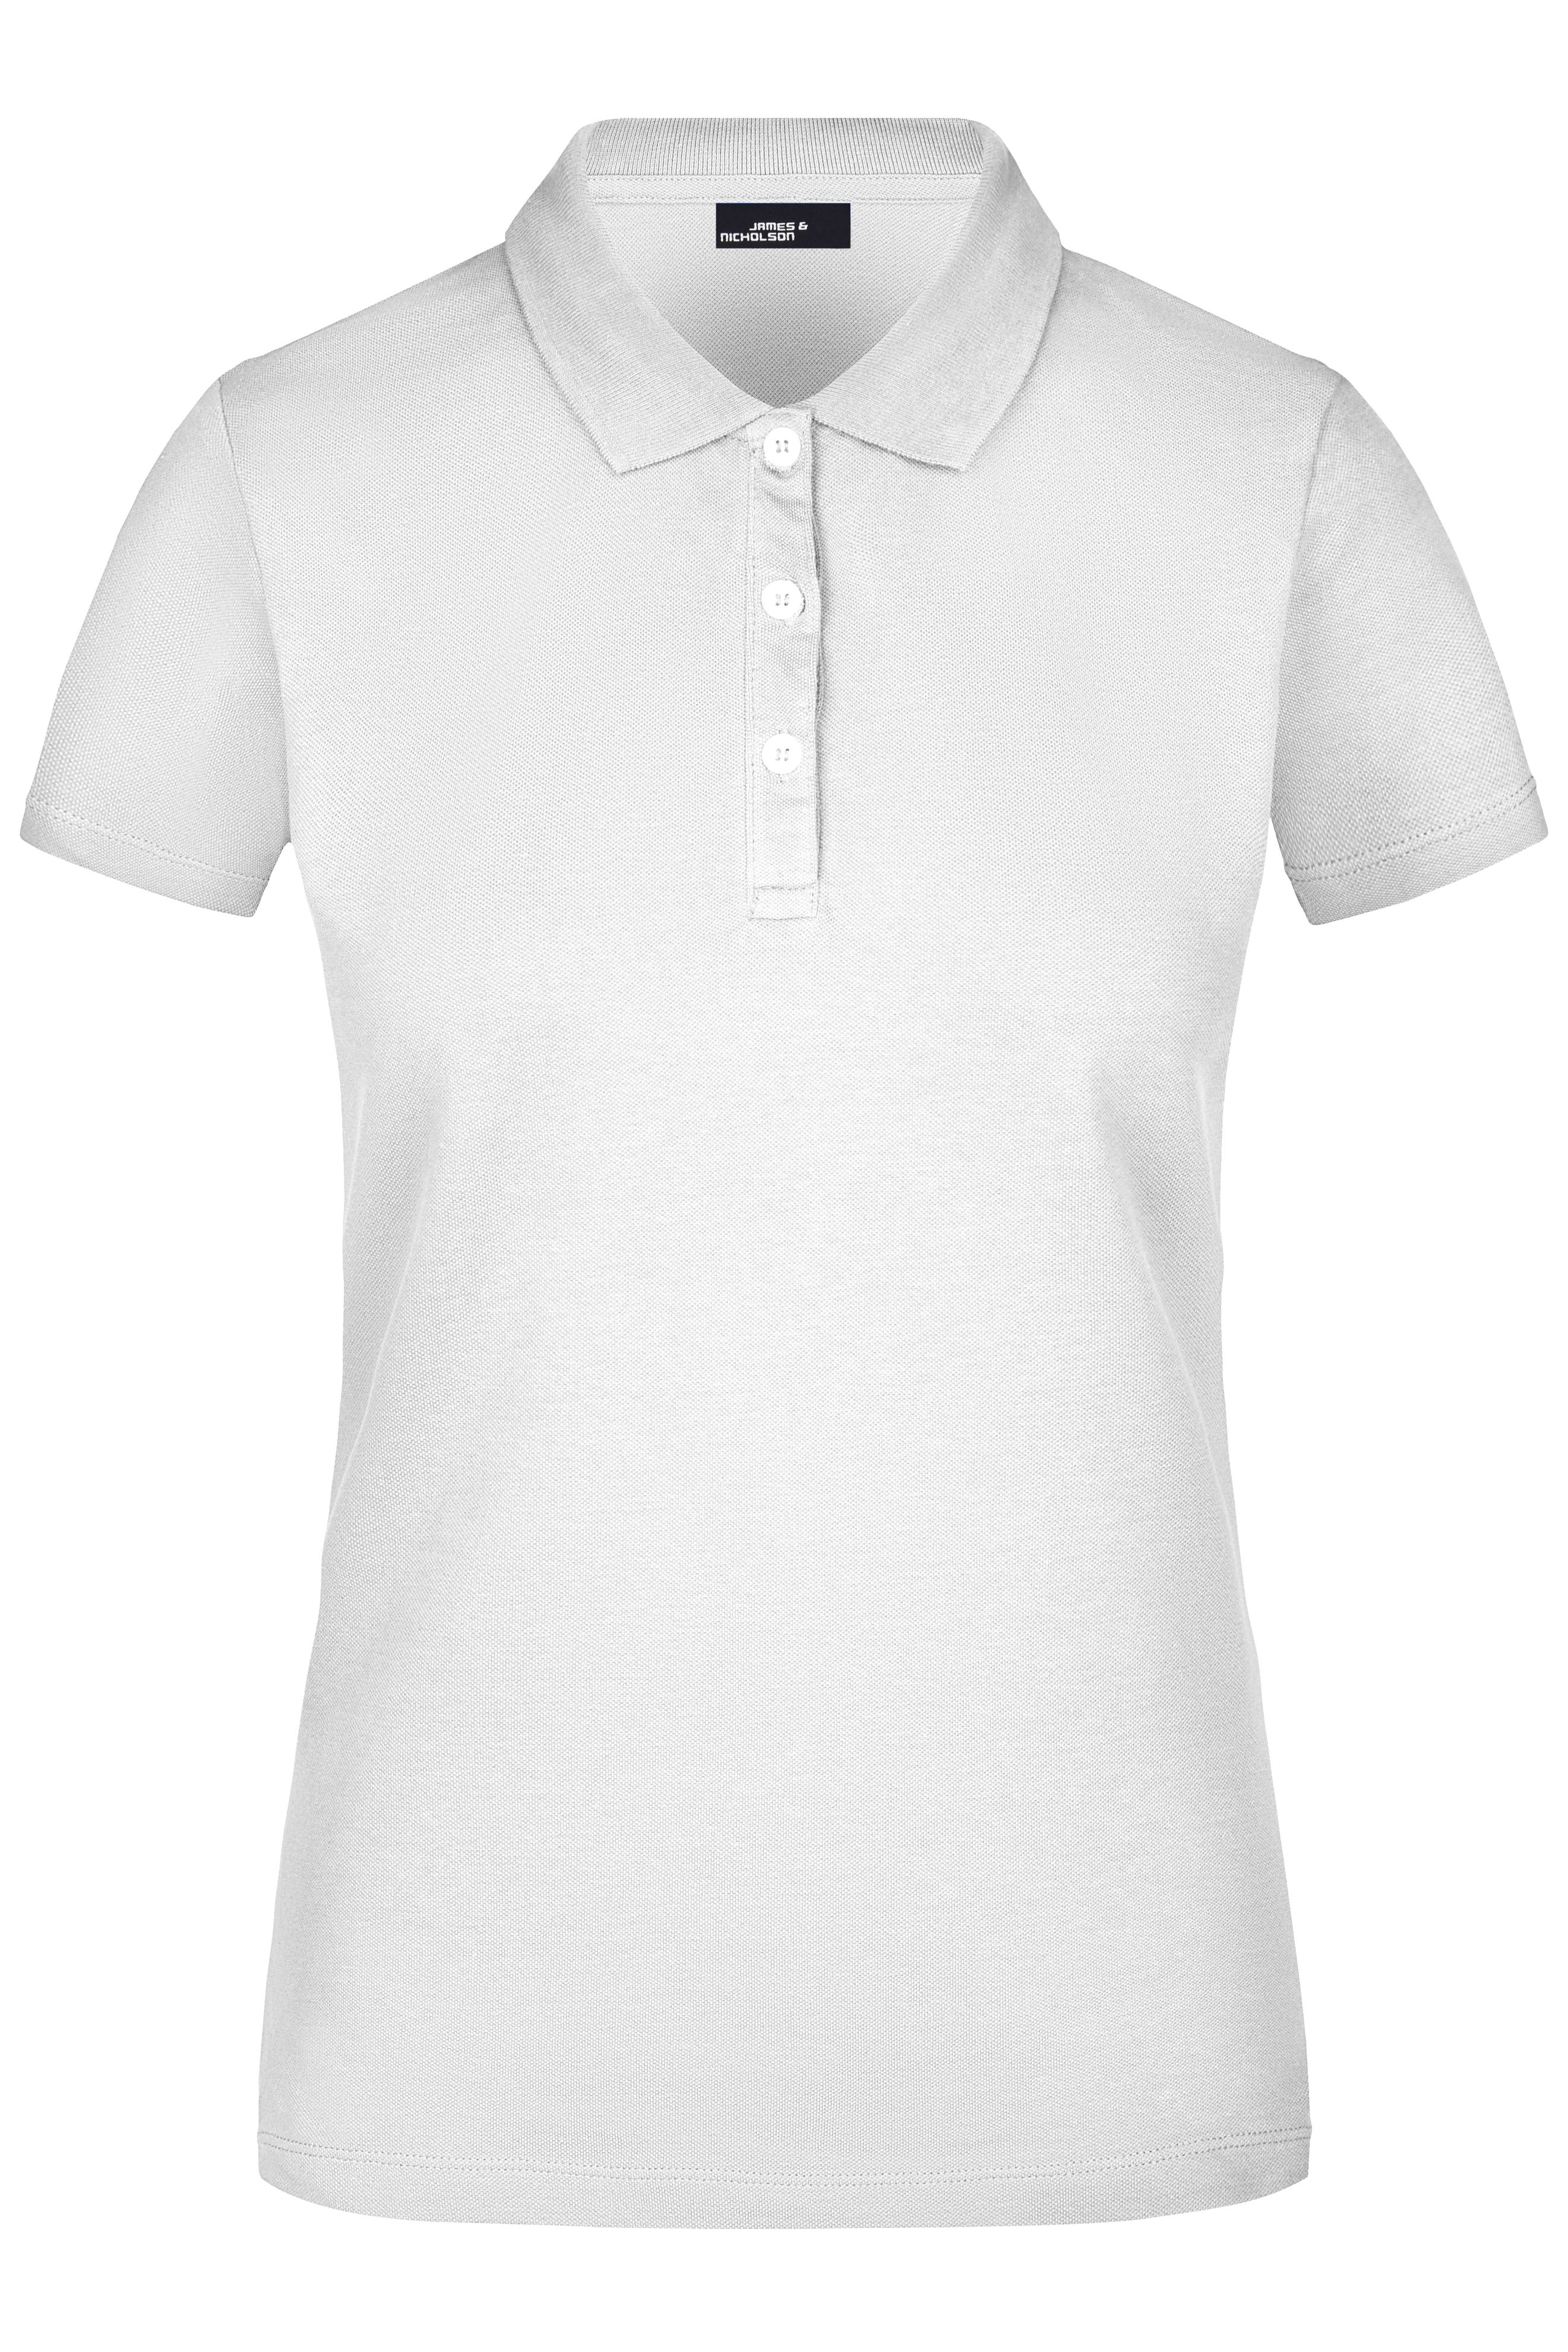 Kurzarm Damen Poloshirt mit hohem Tragekomfort